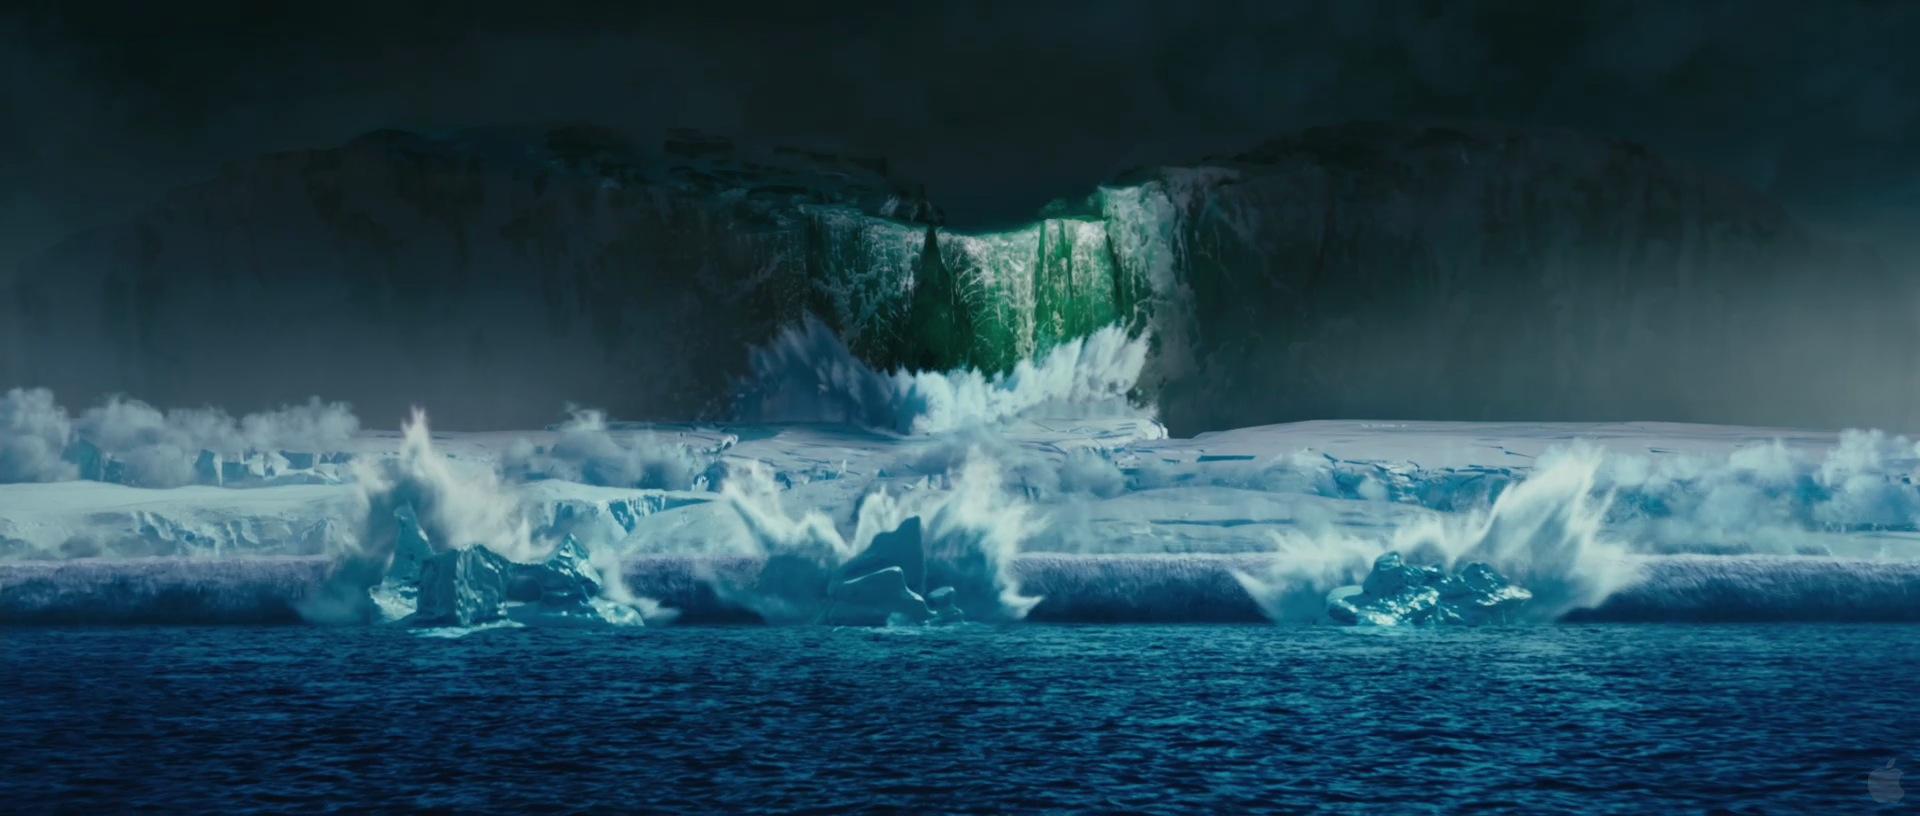 Glacier Calving in Happy Feet Two Desktop Wallpaper 1920x816